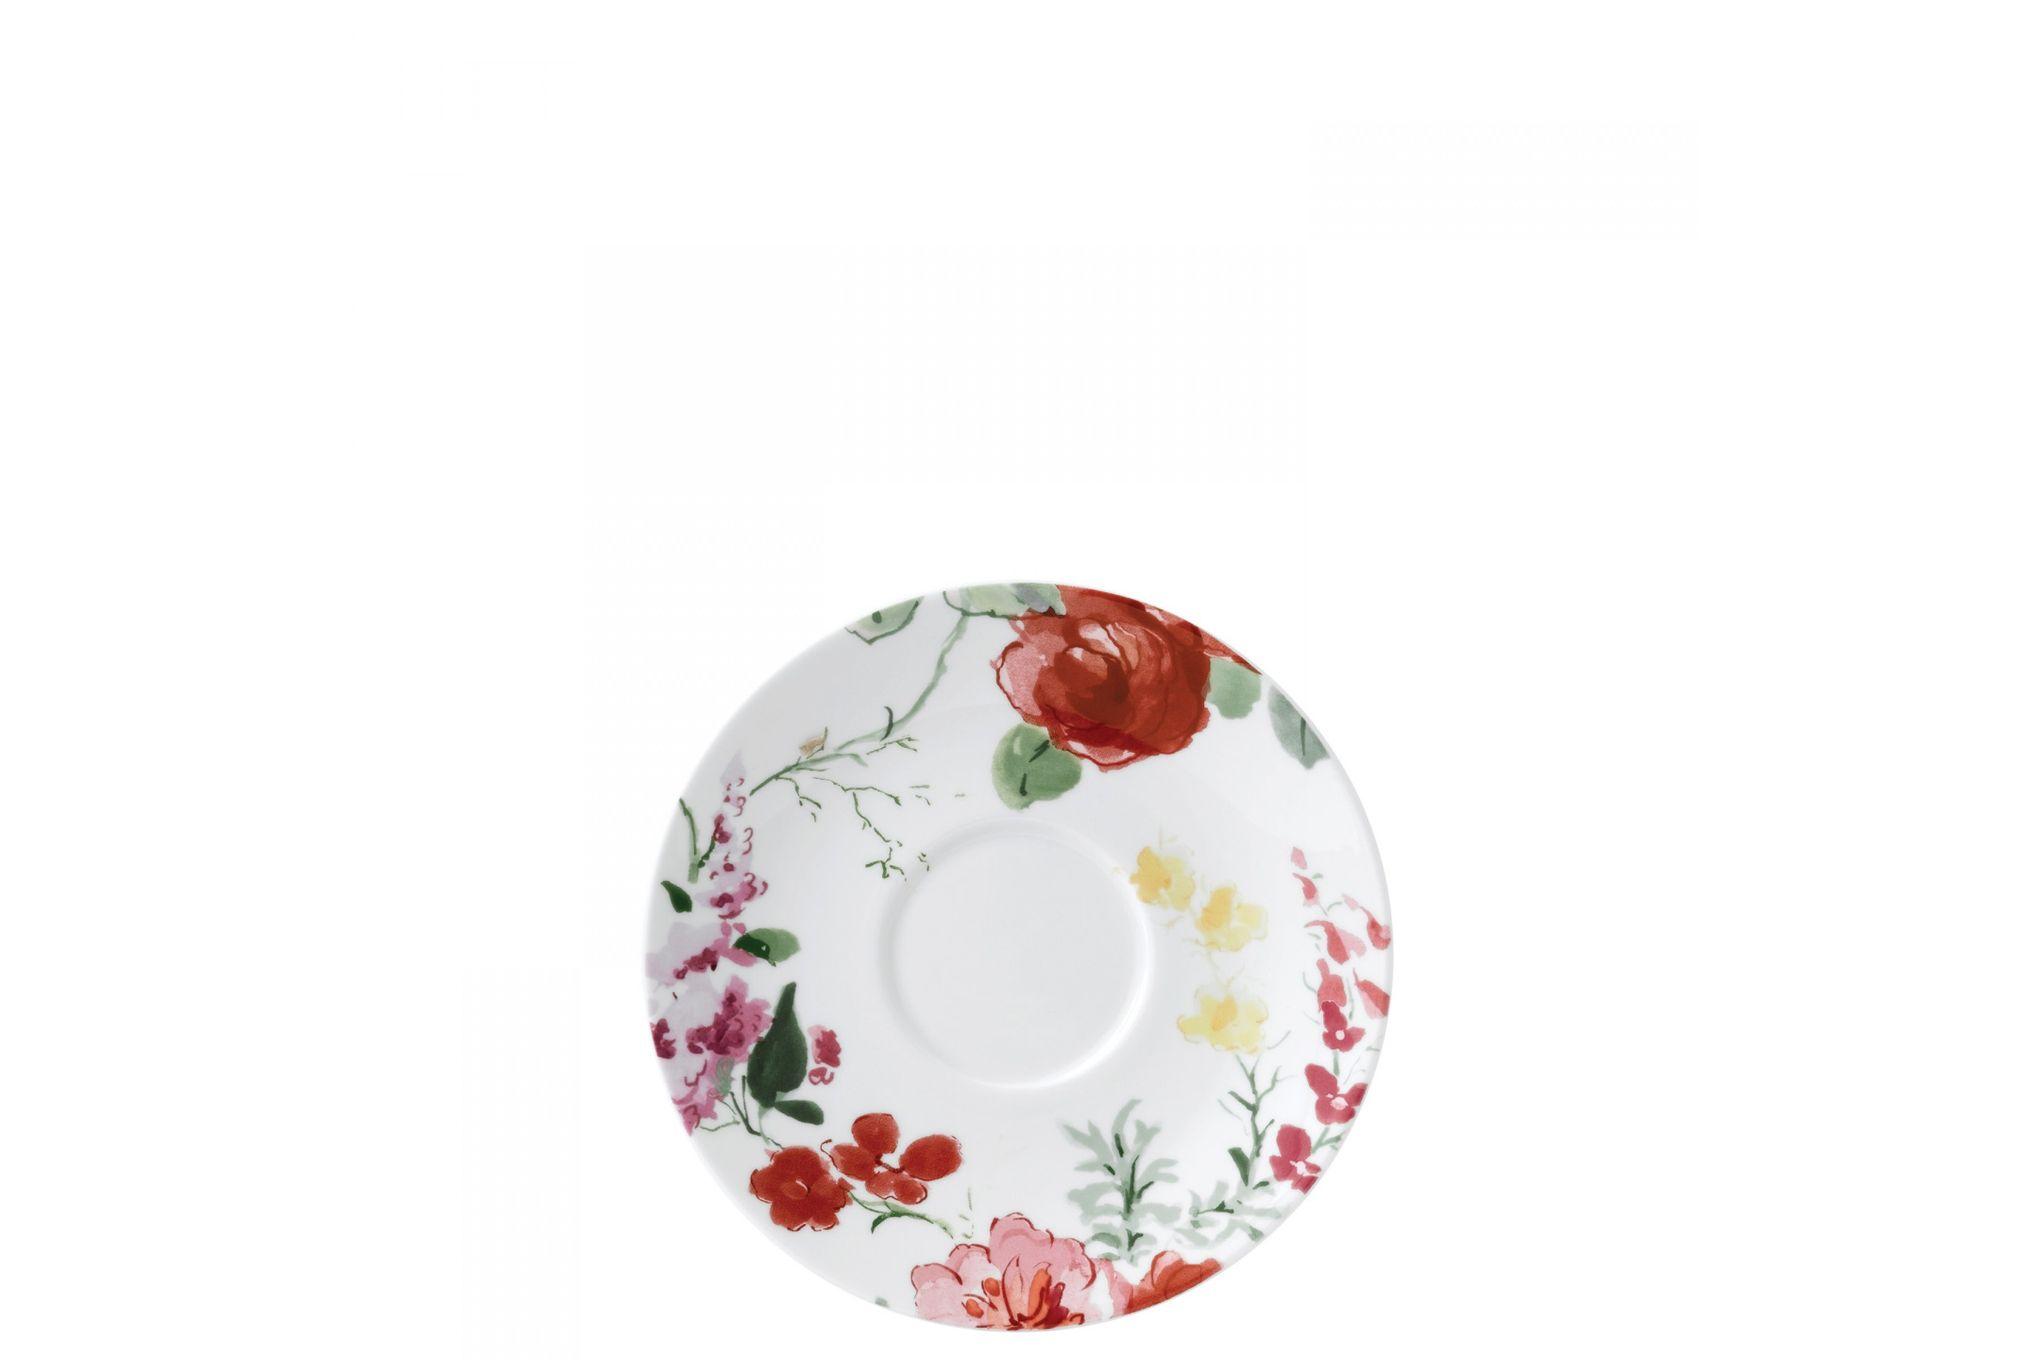 Jasper Conran for Wedgwood Floral Tea Saucer thumb 1